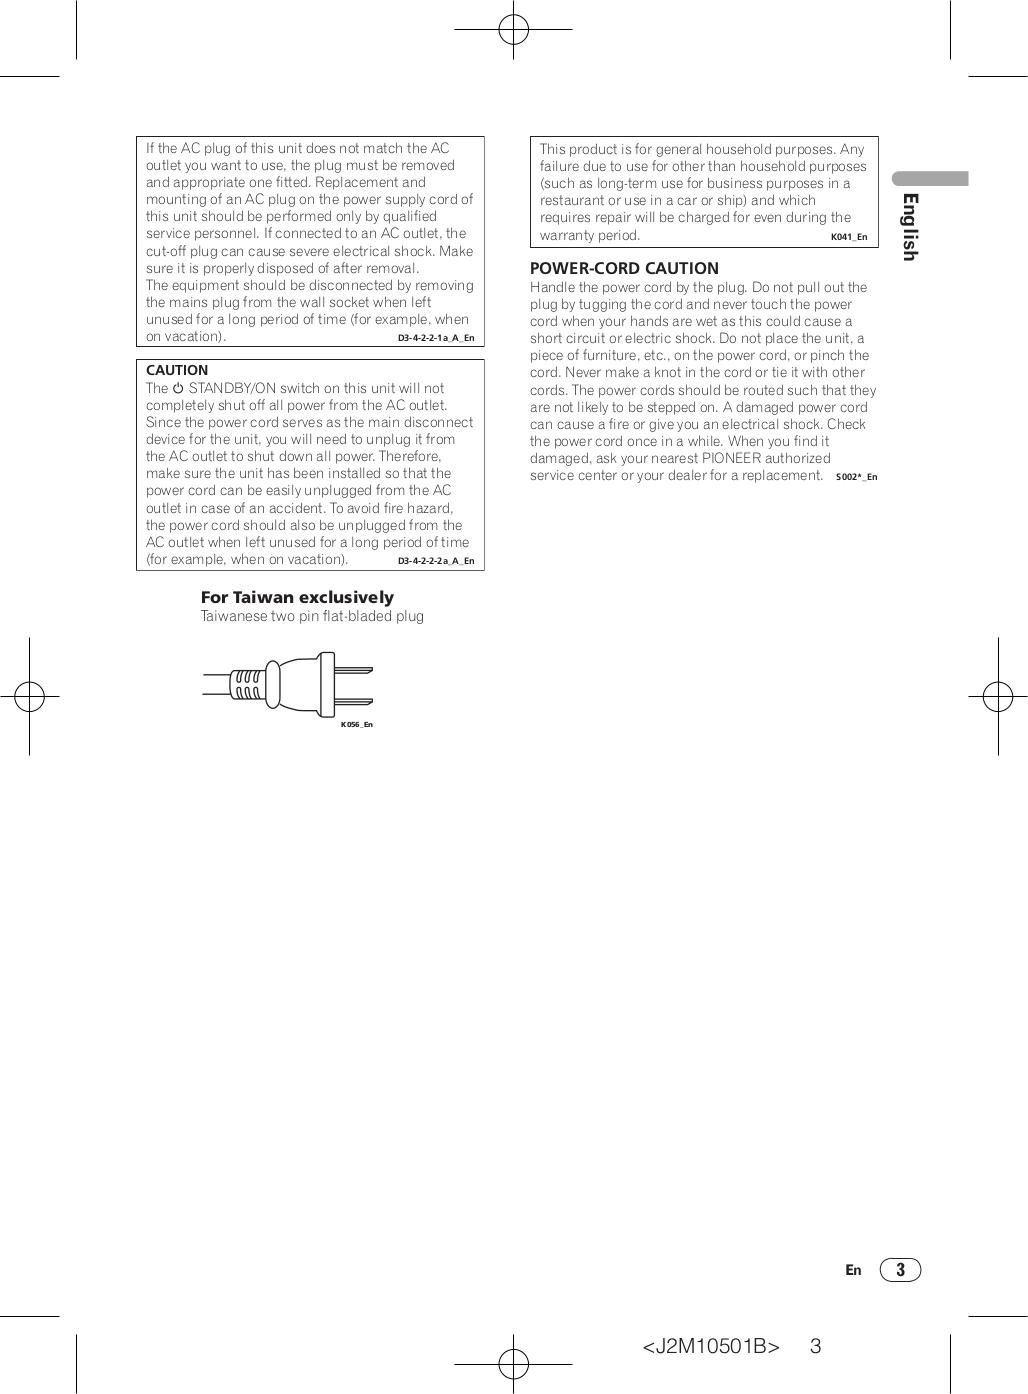 PDF manual for Sharp Microwave R-1201